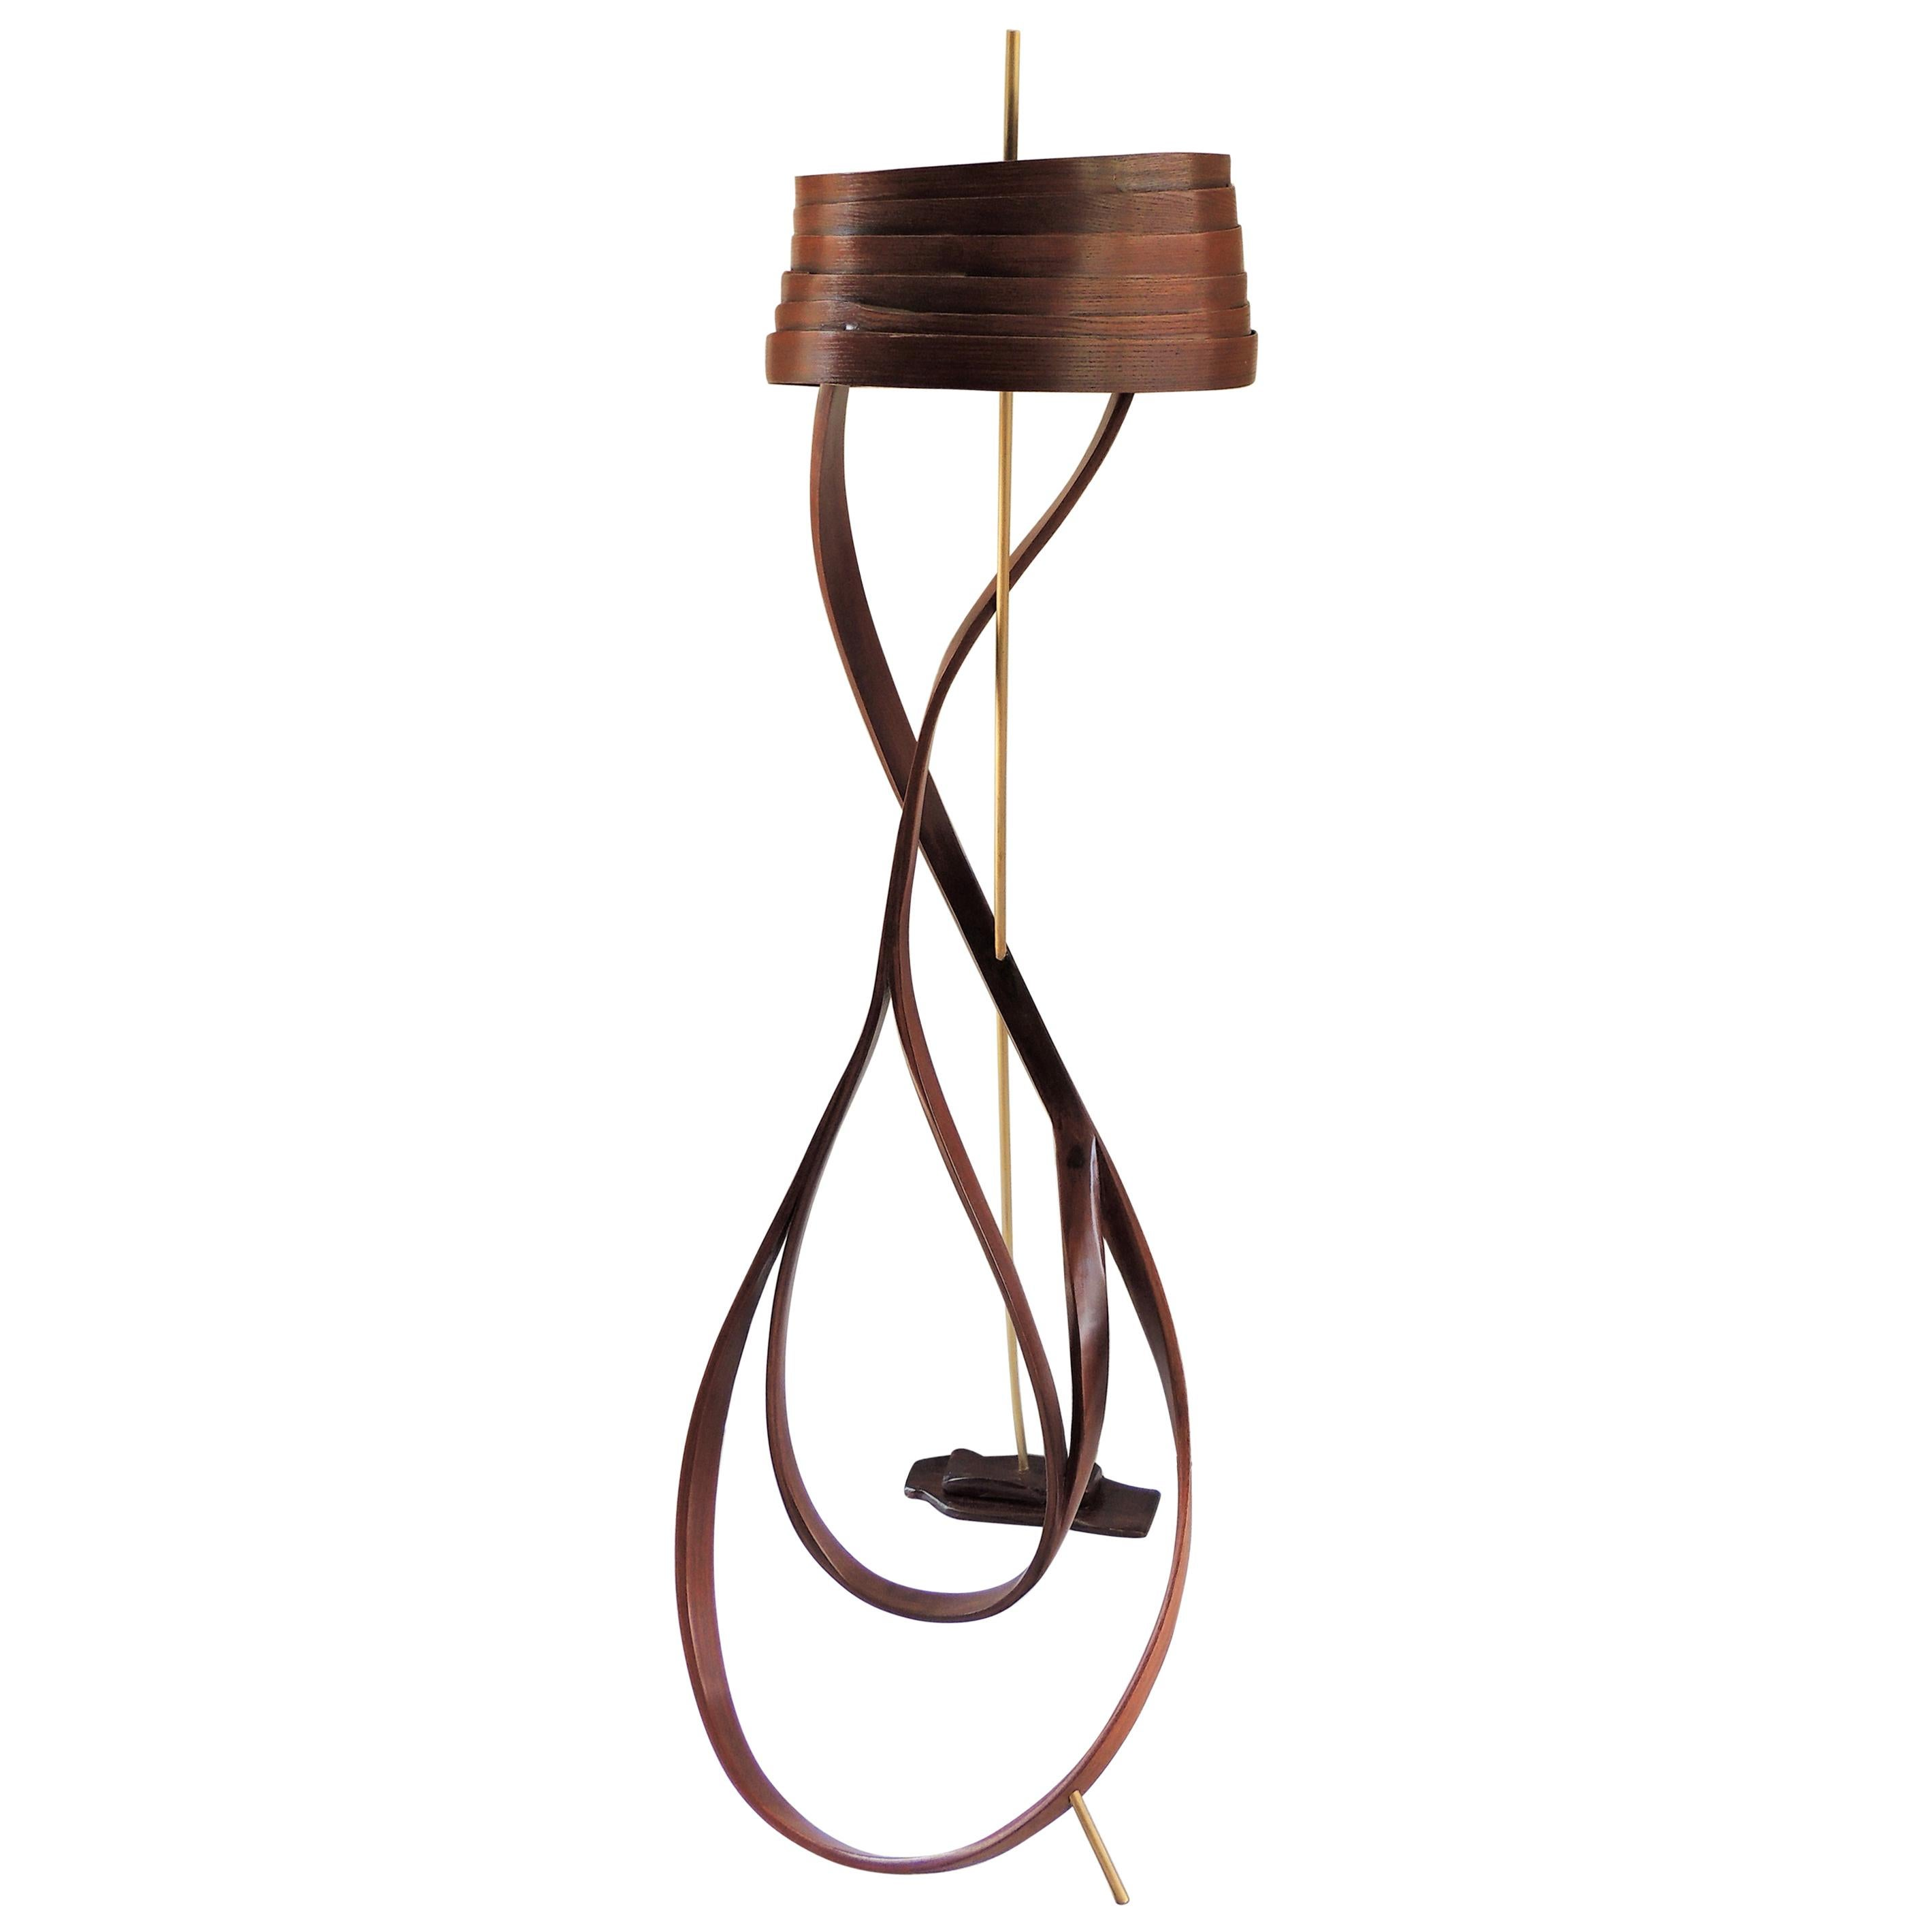 Brown Bent Wood Floor Lamp with Brass Detail by Raka Studio